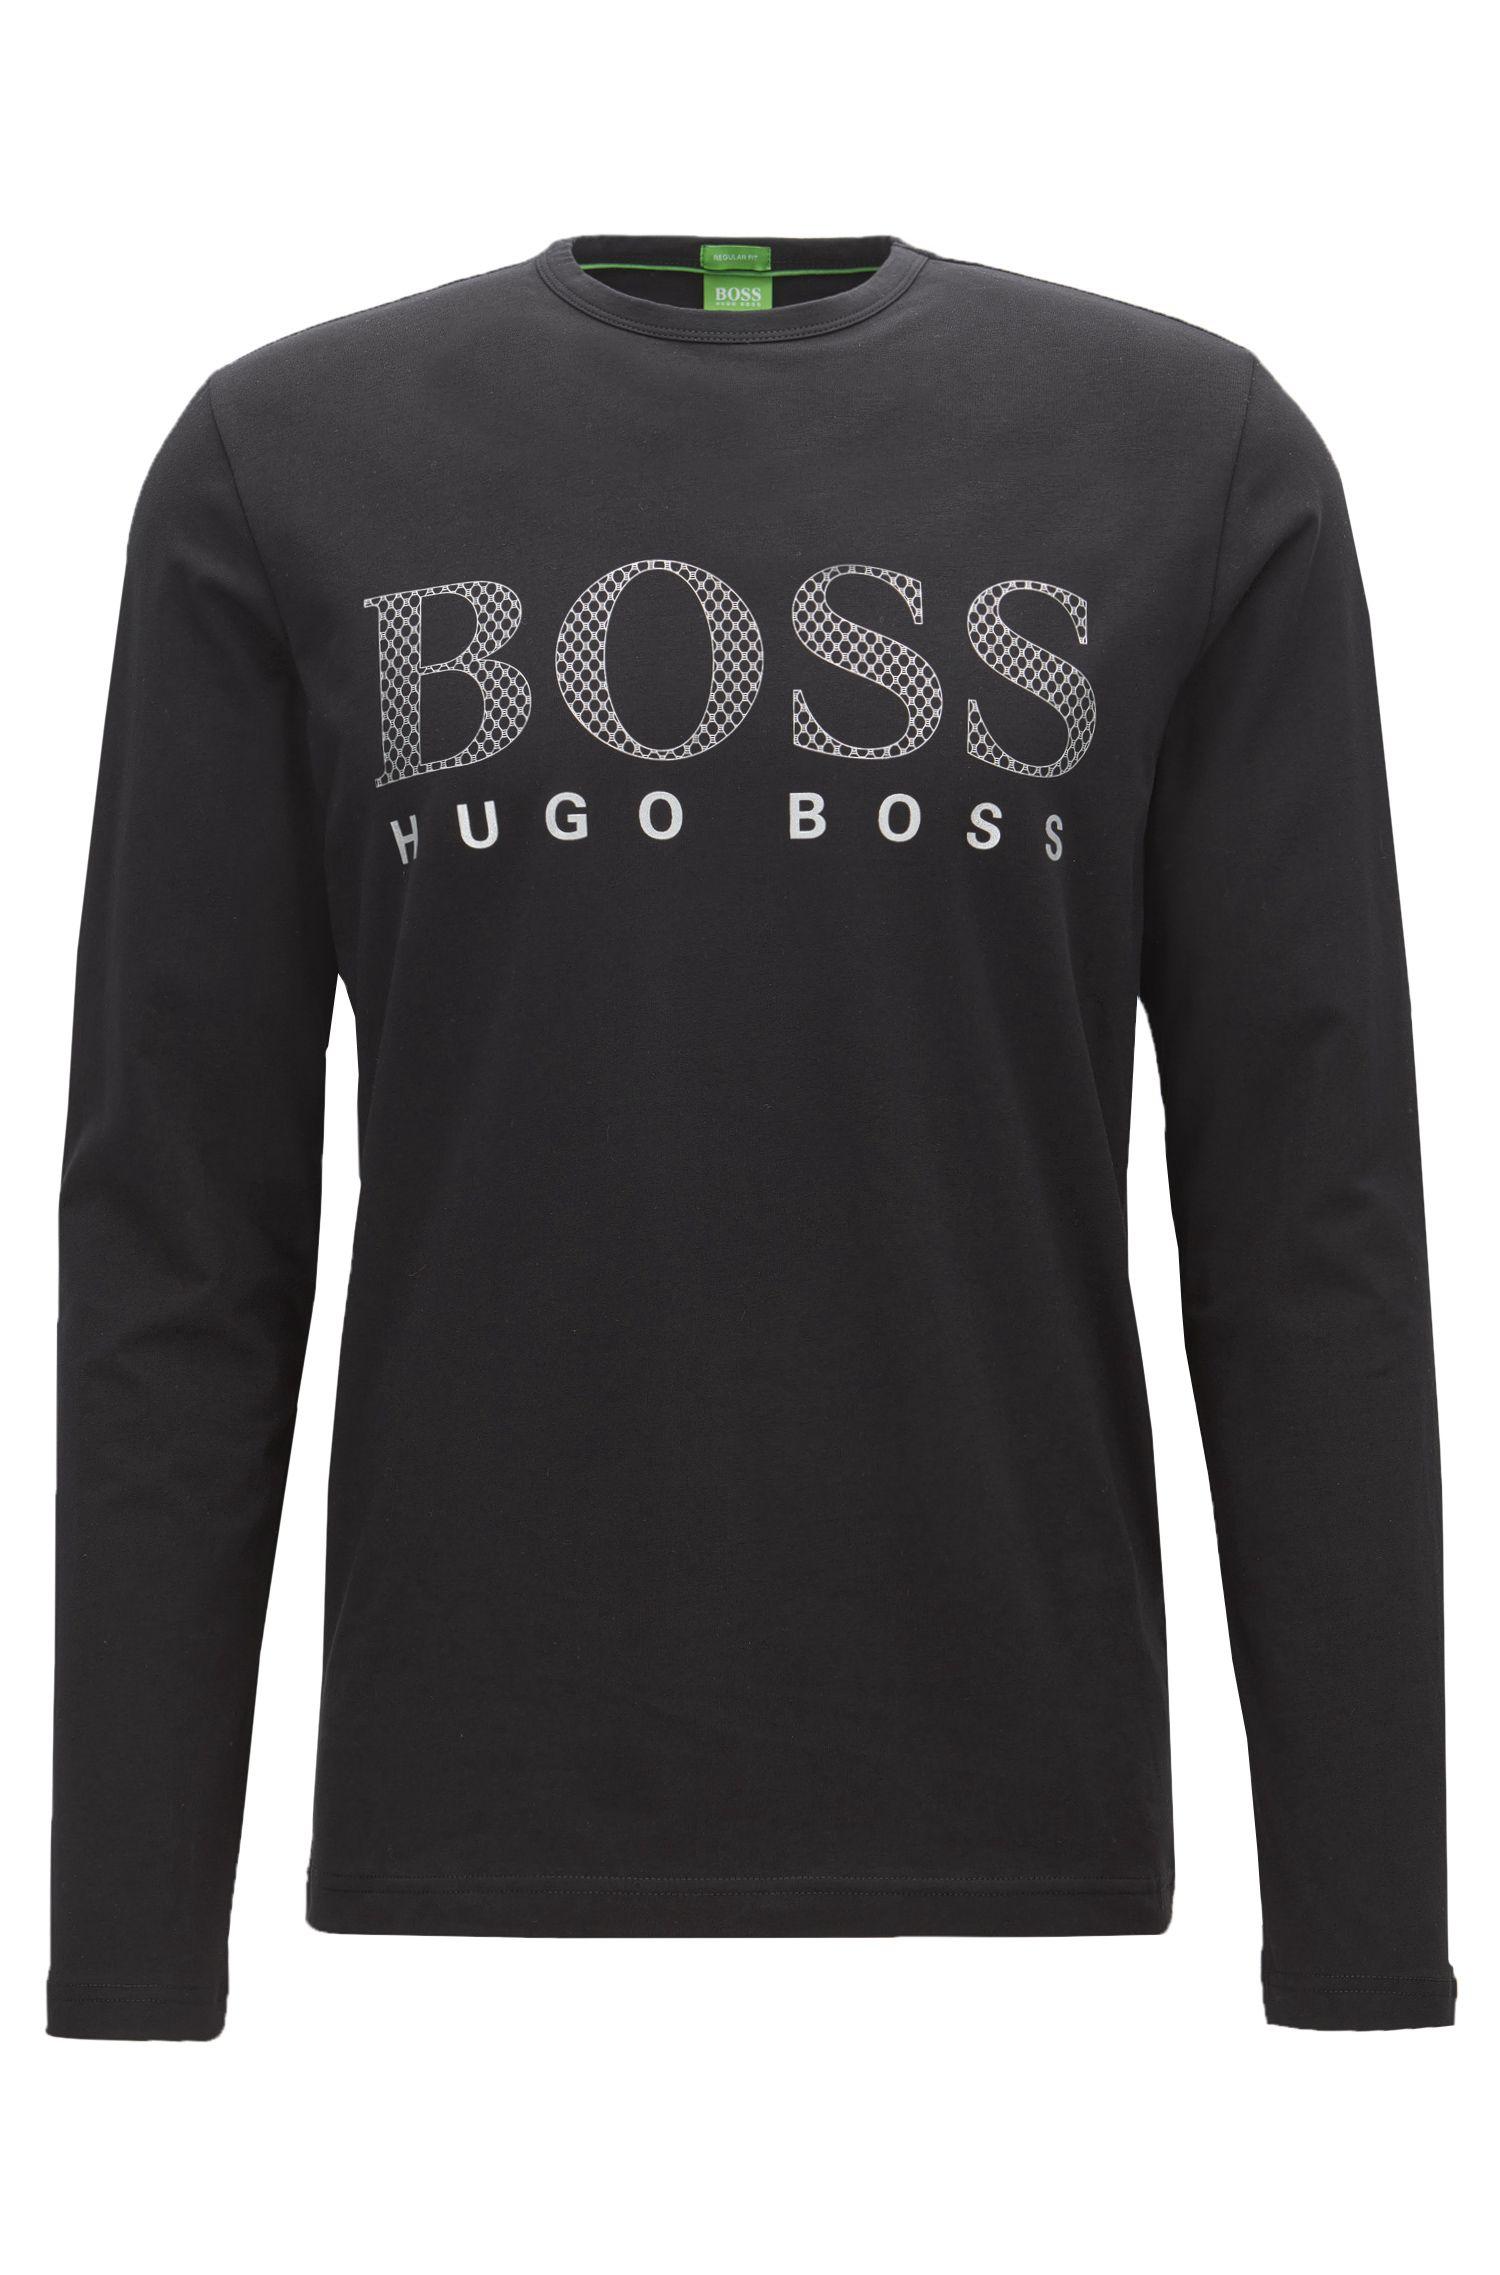 Regular-fit long-sleeved jersey T-shirt with tonal logo print